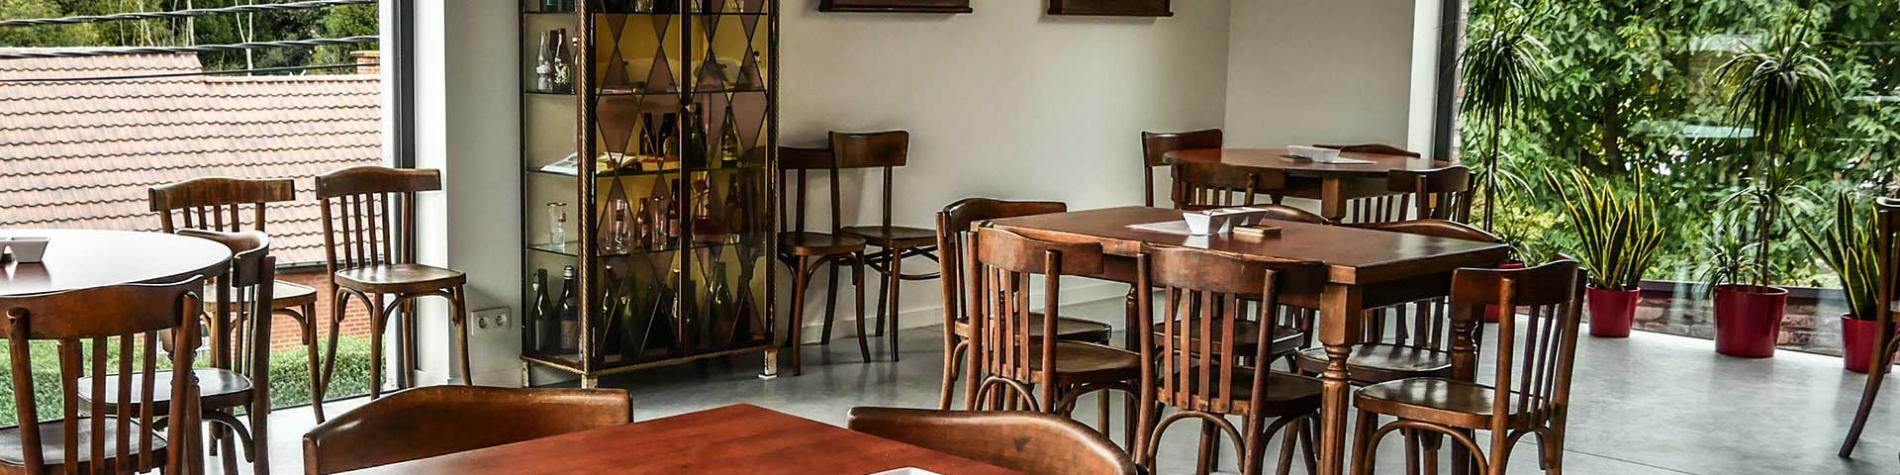 Visit'Entreprise - Brasserie de Ranke - Copyright Bruno Bosilo